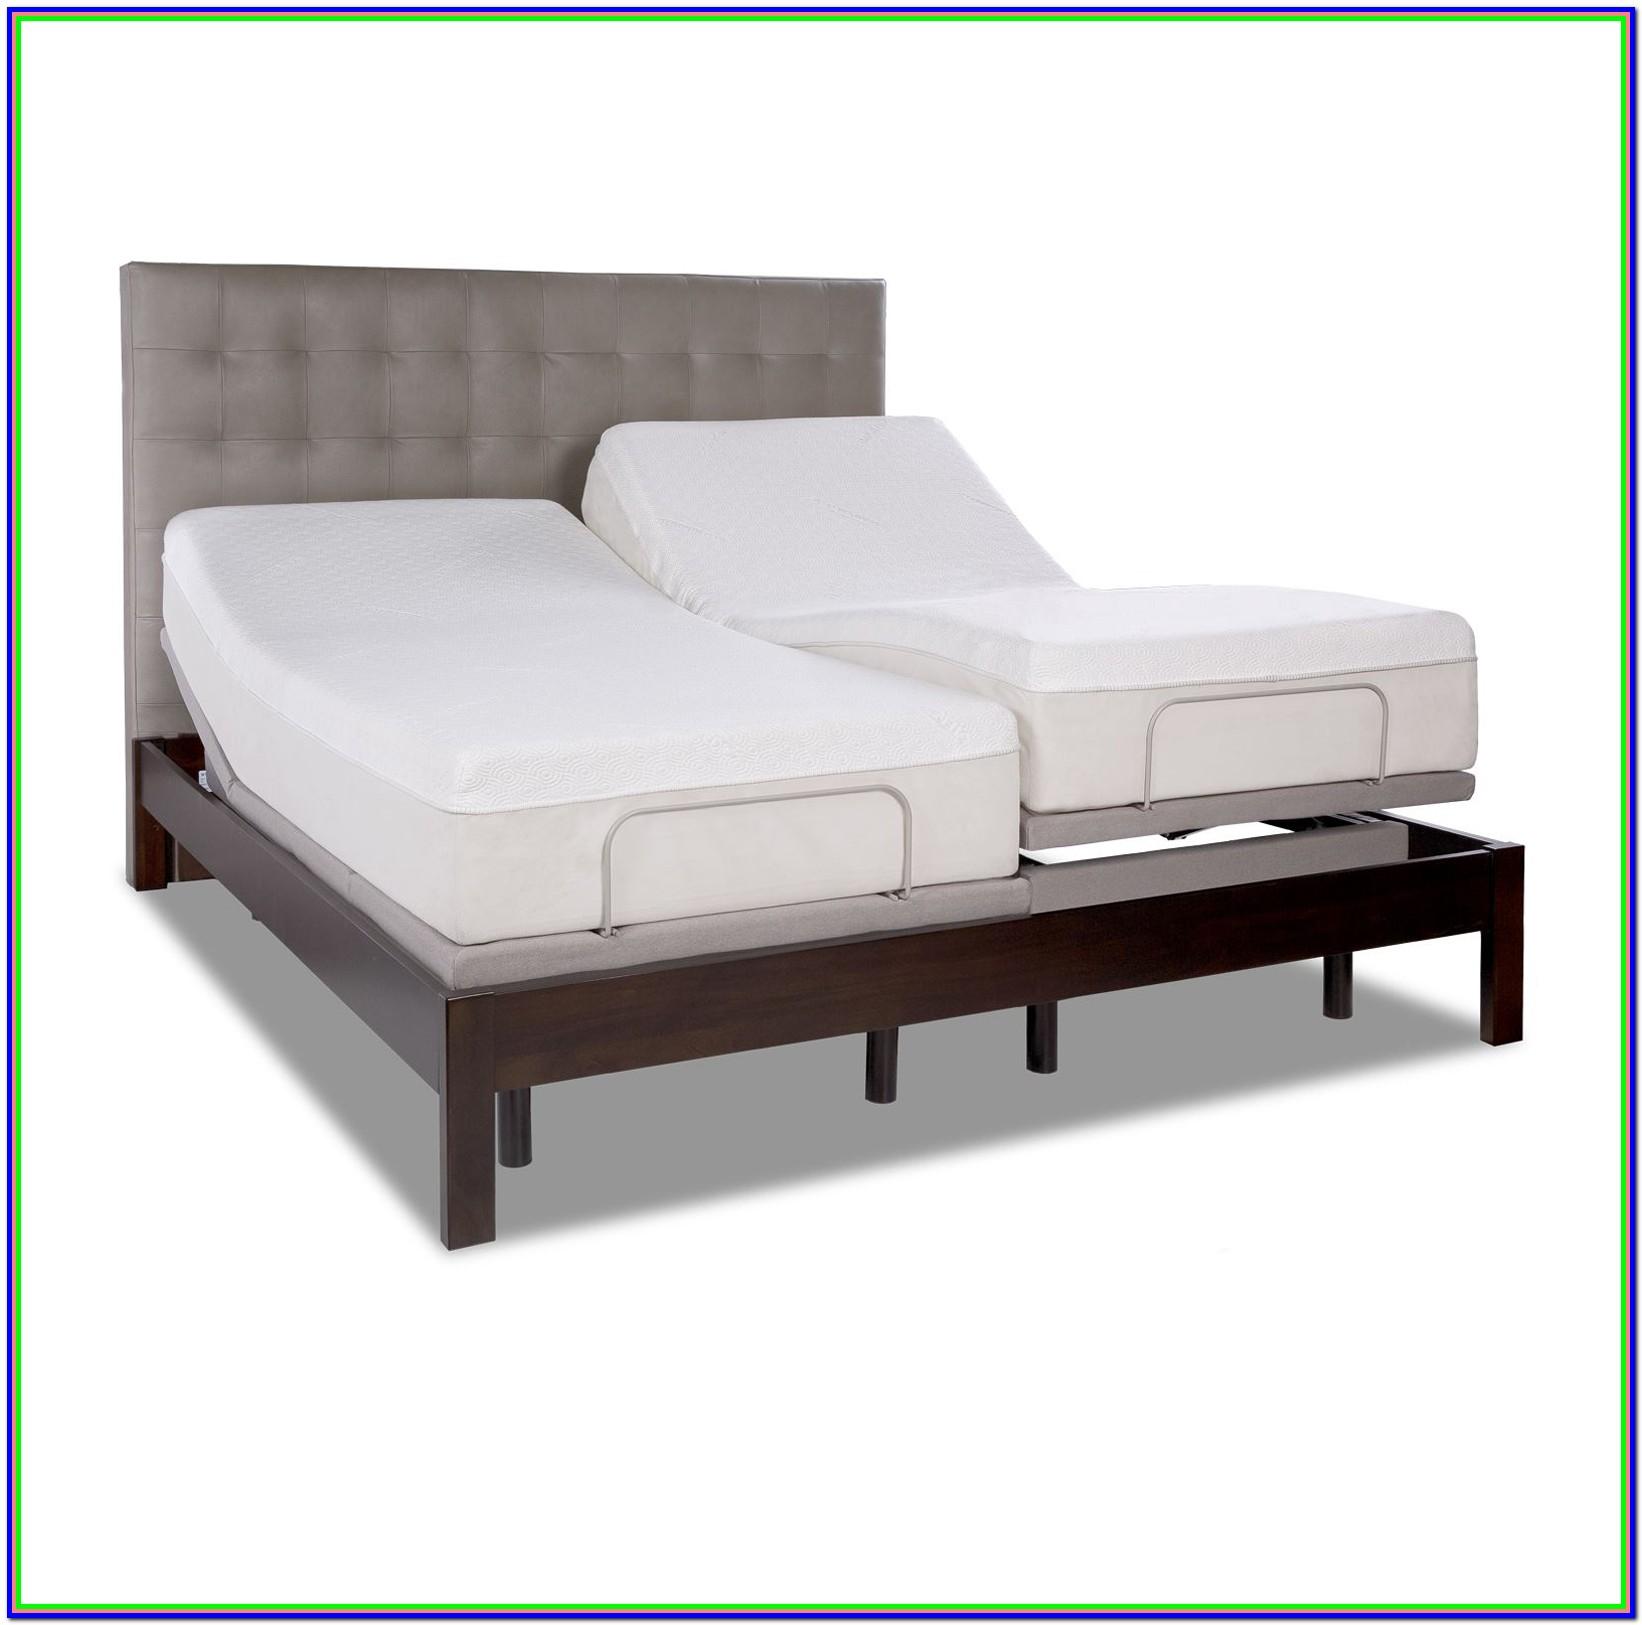 Tempur Pedic Queen Adjustable Bed Frame